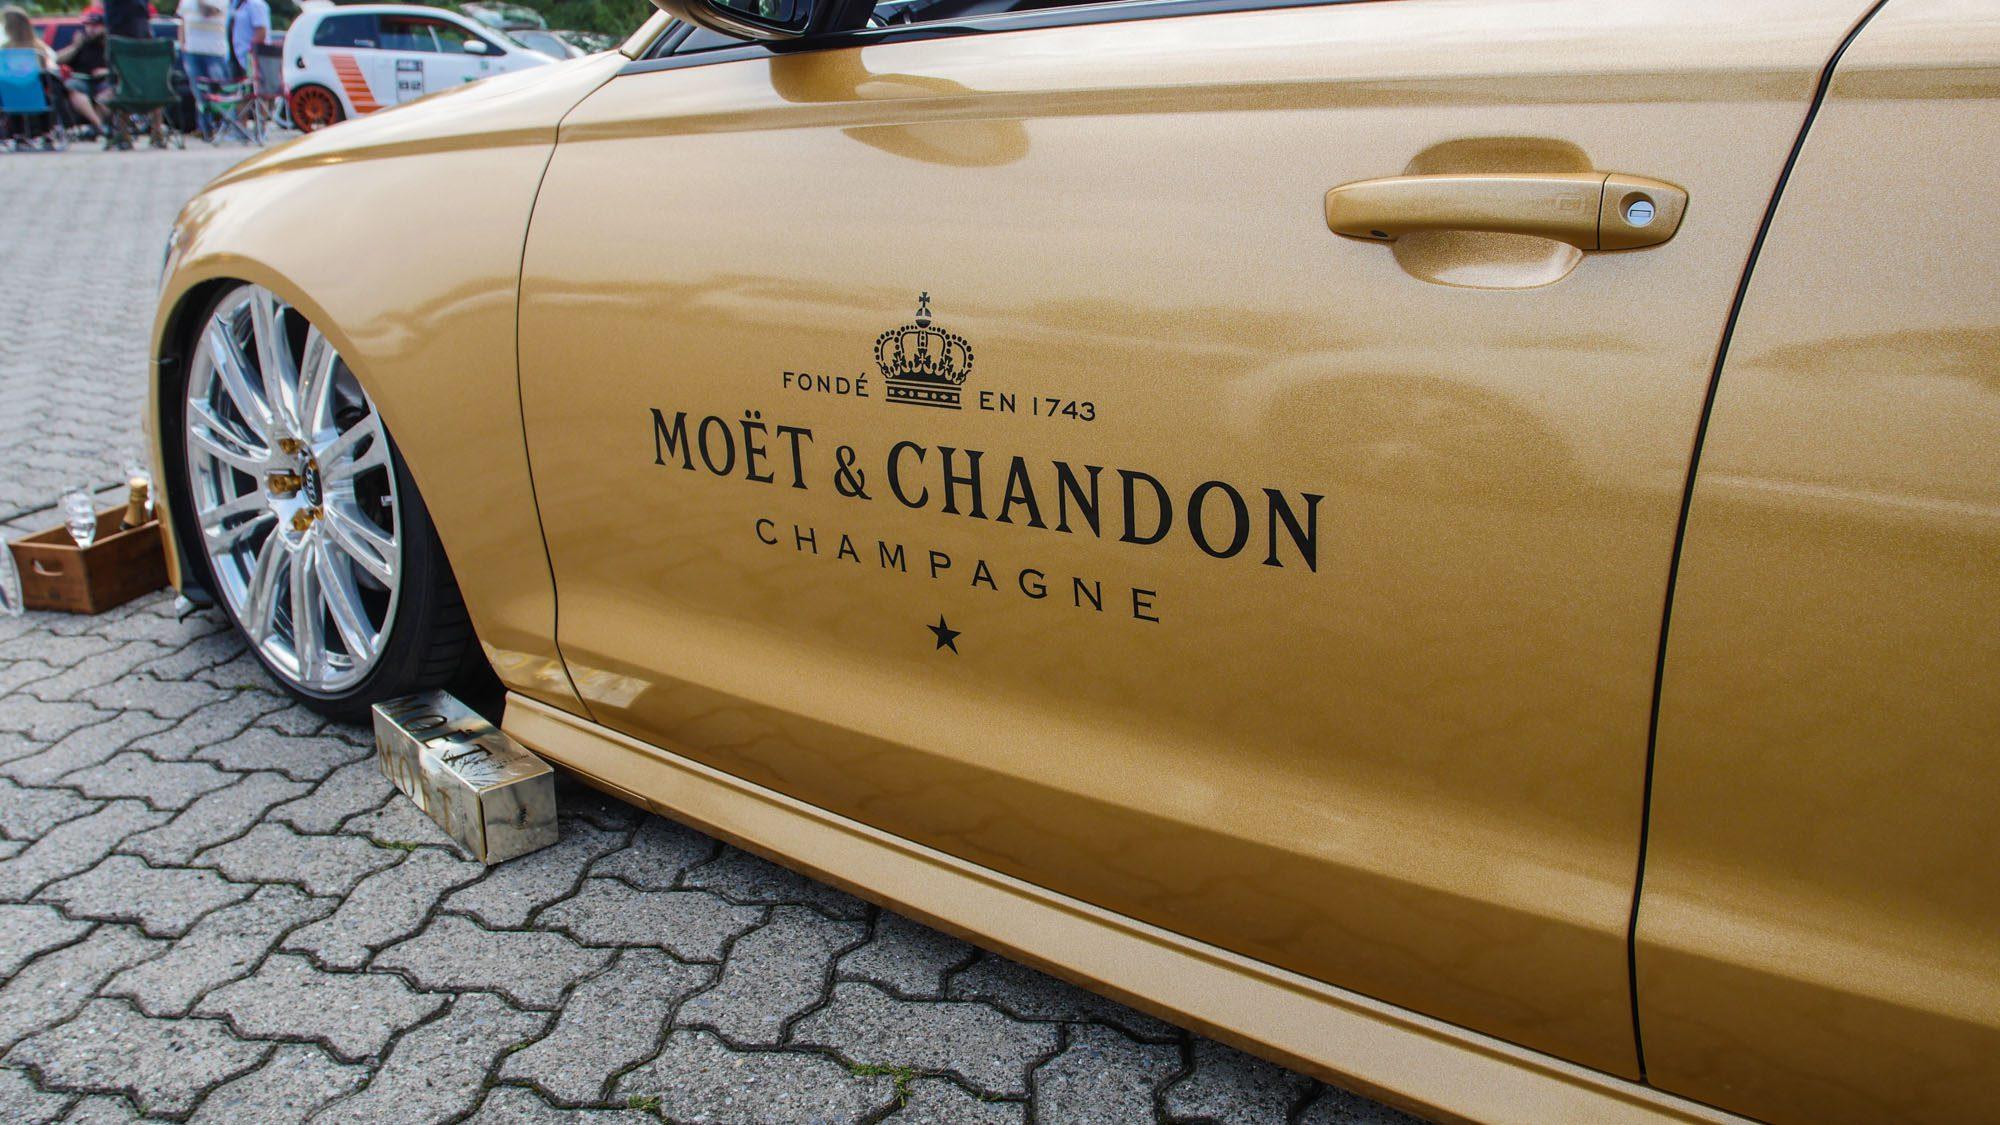 Logo von Moët & Chandon auf dem Audi A6 Avant